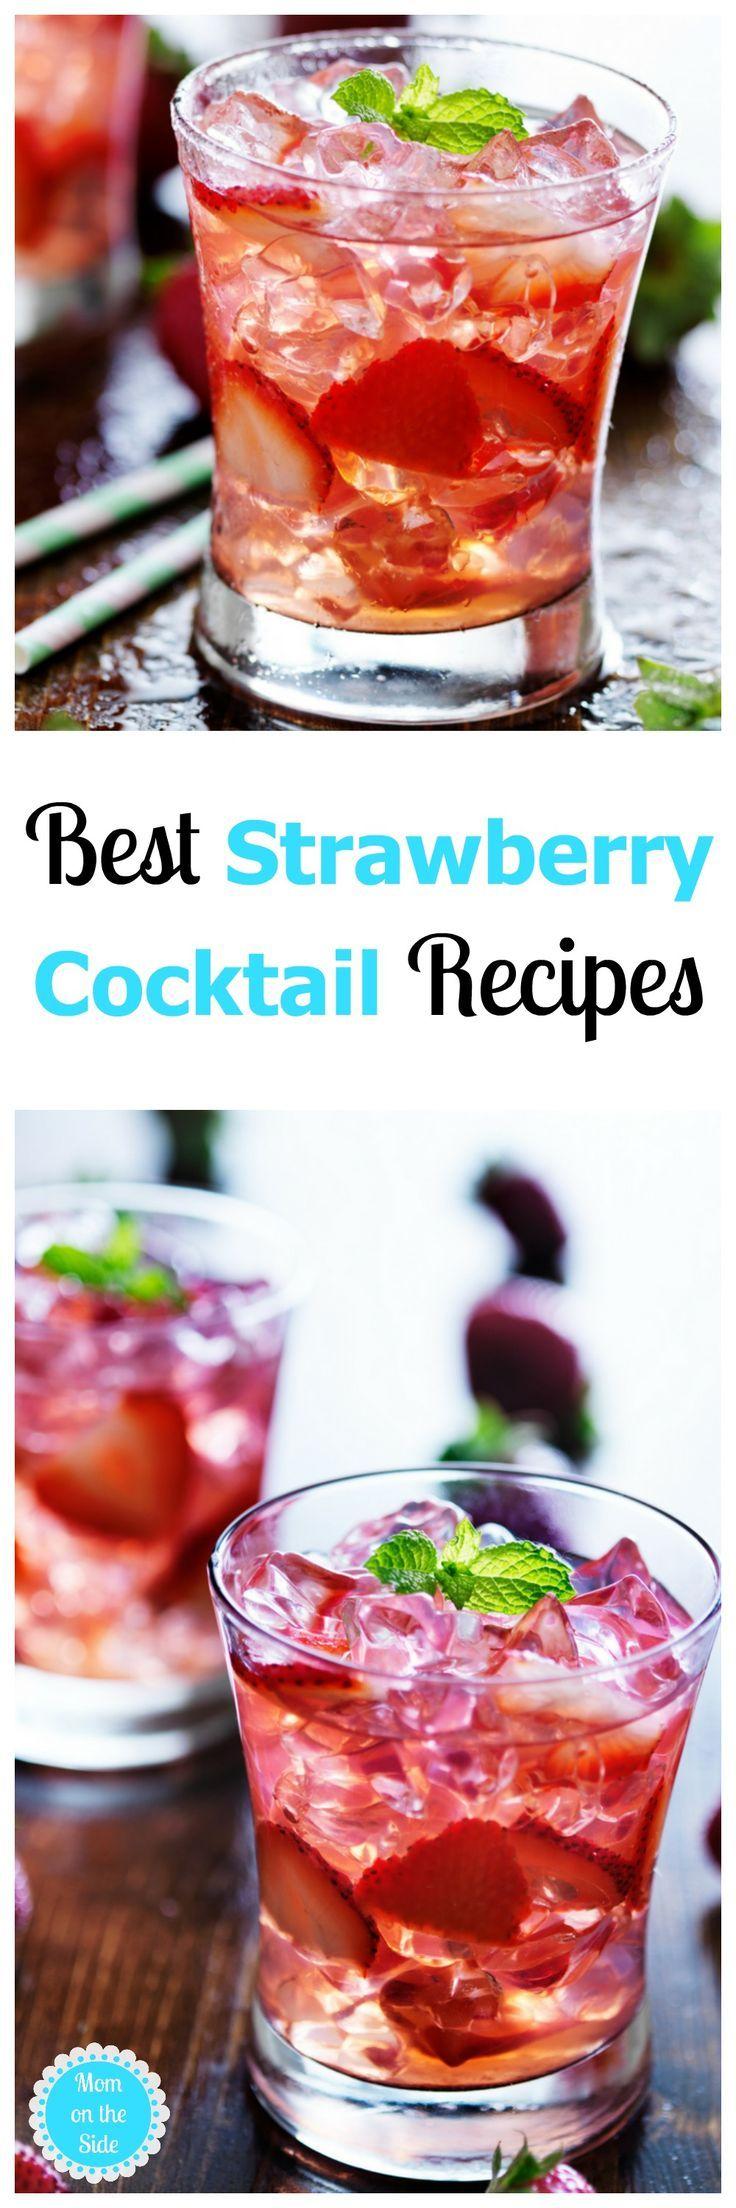 632 best Cocktails, & Great Drink Recipes images on Pinterest